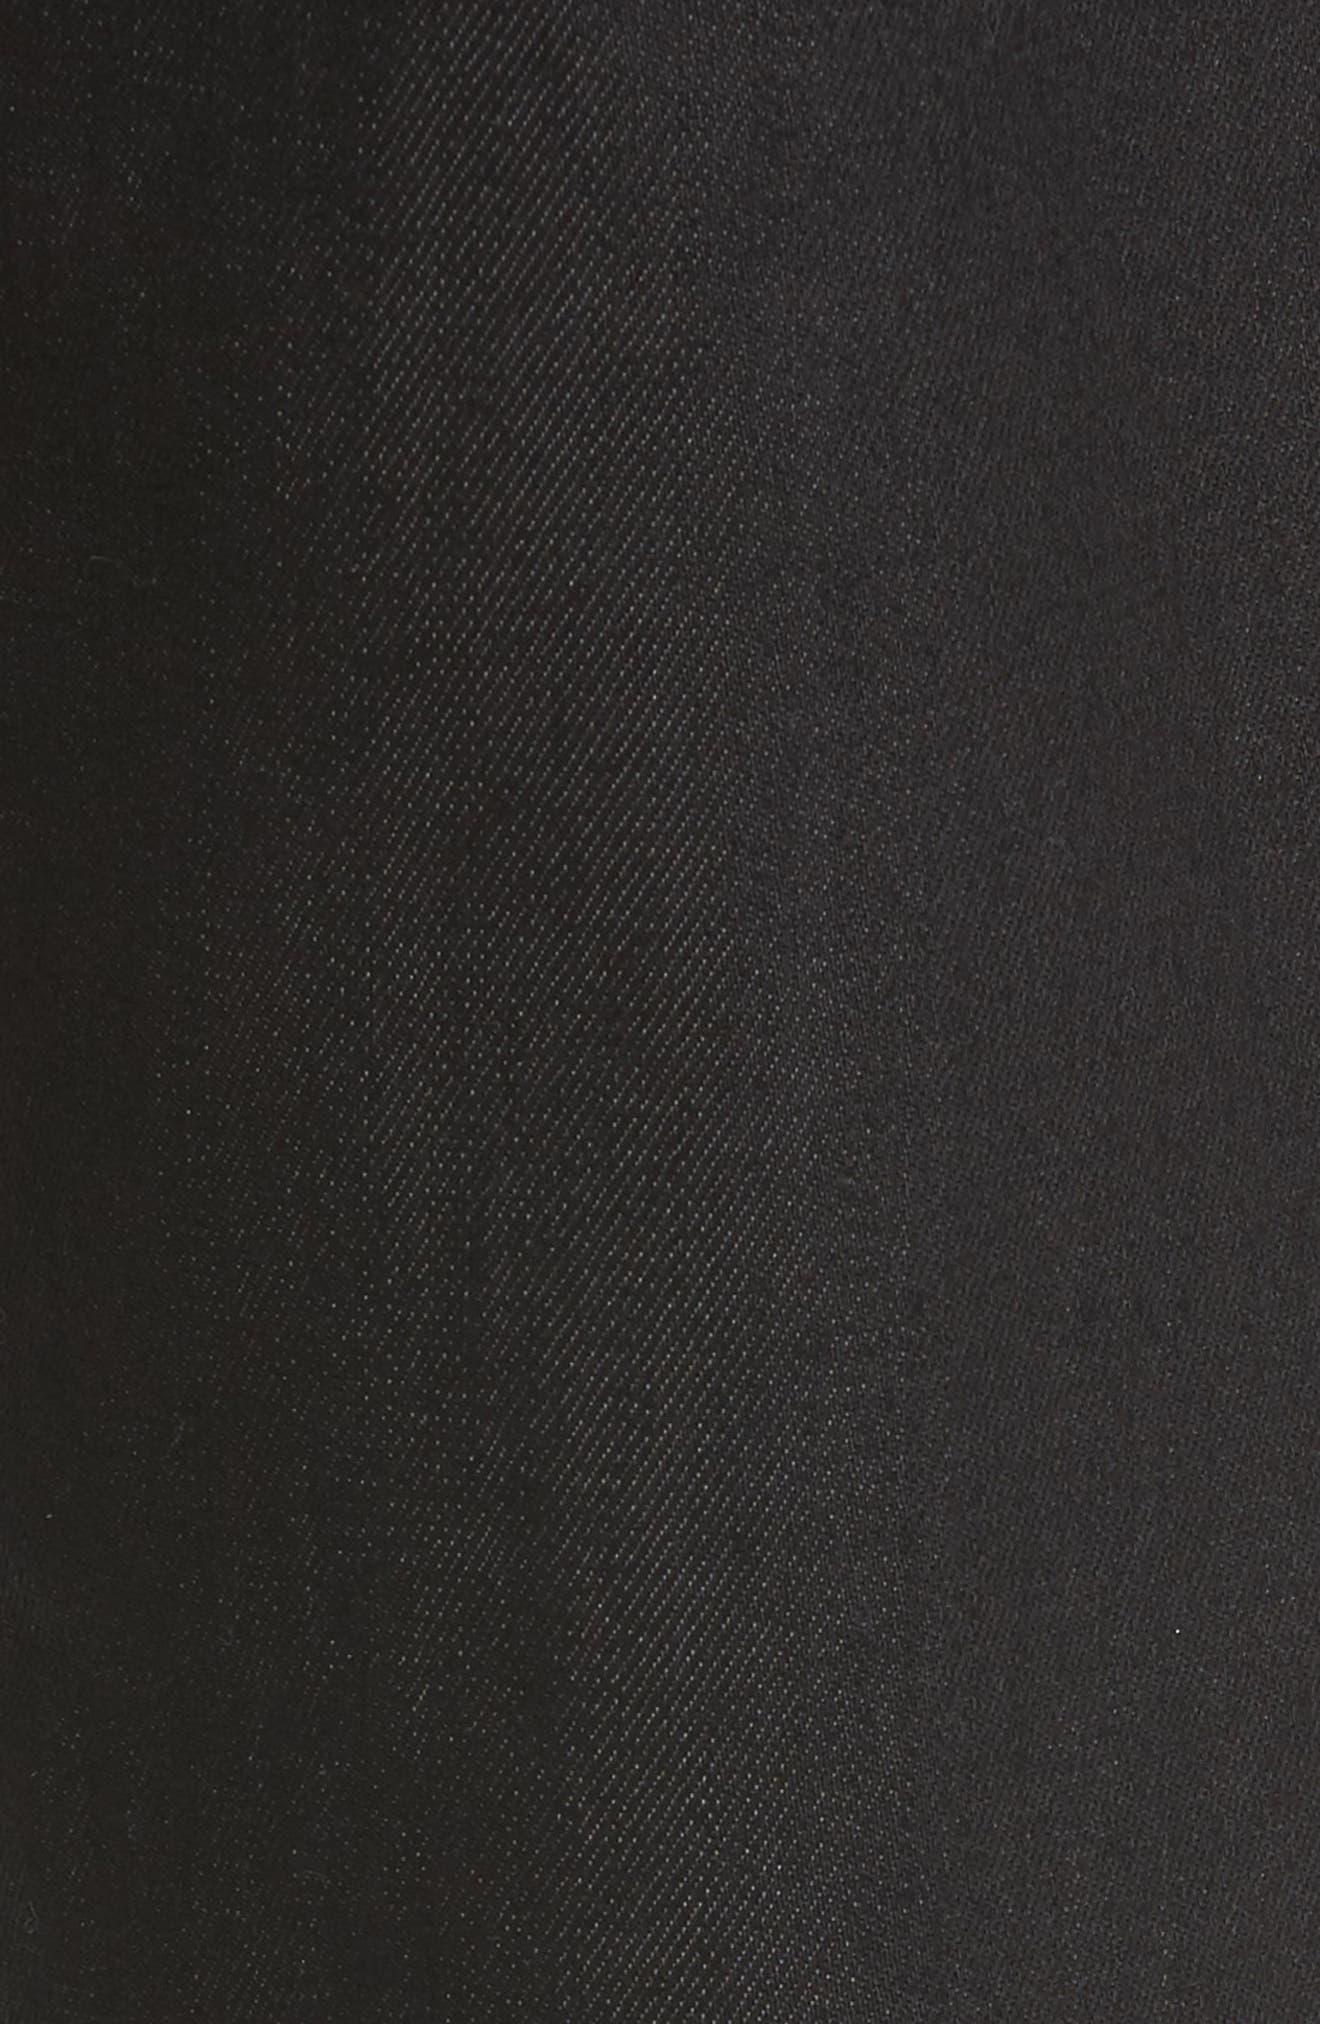 Airweft - Slimmy Slim Fit Jeans,                             Alternate thumbnail 5, color,                             004